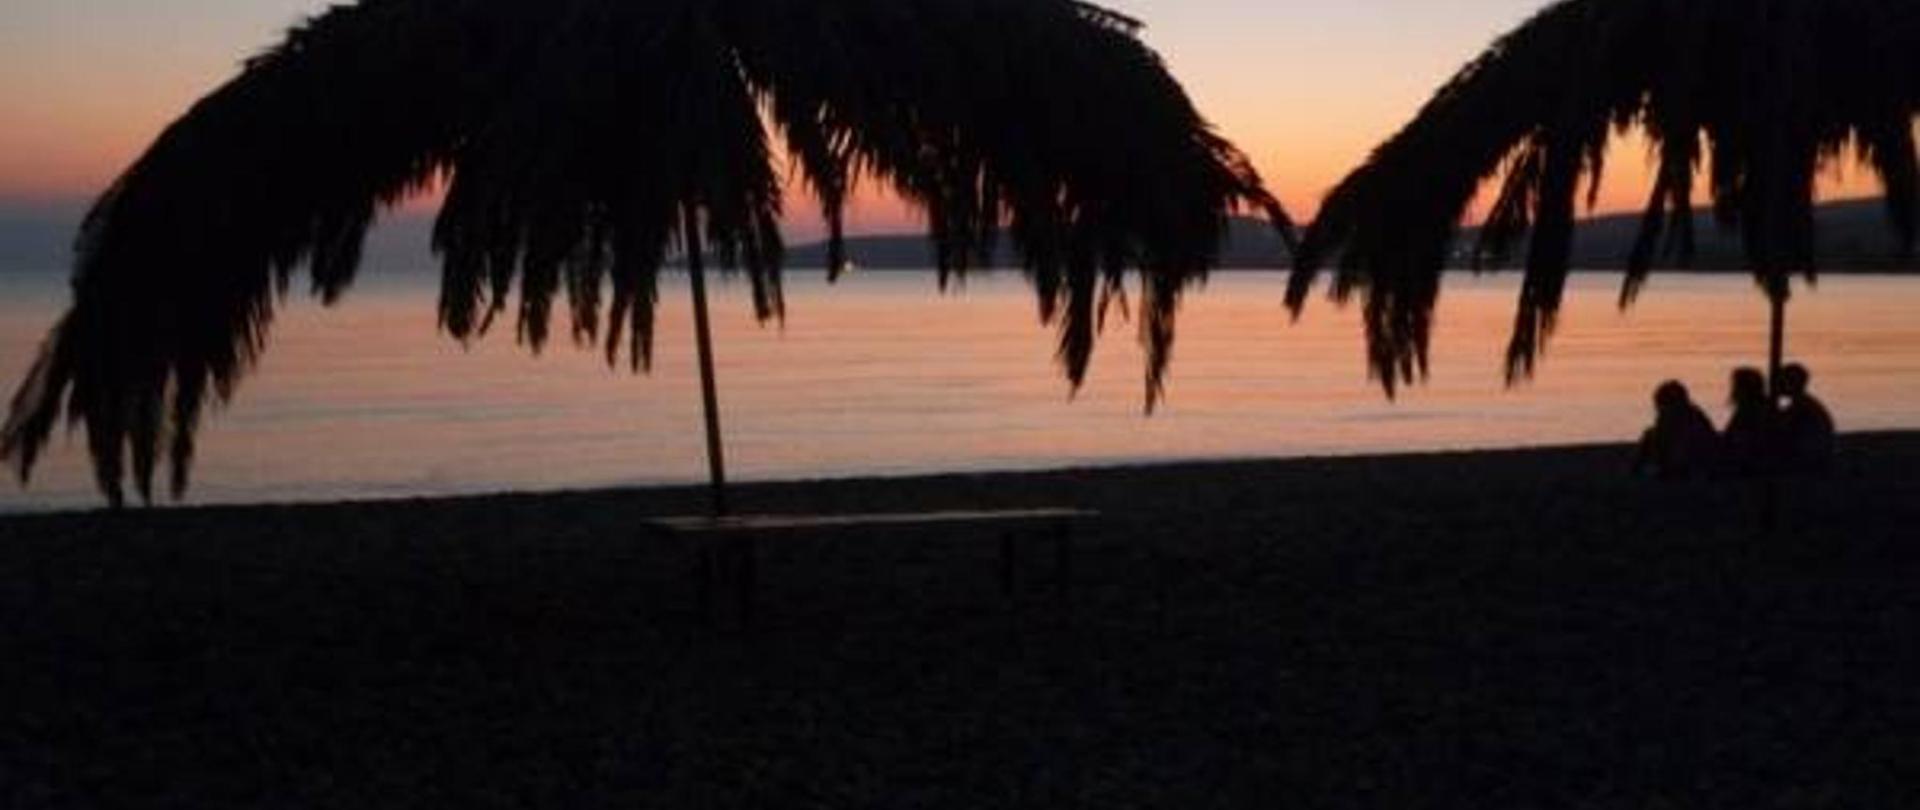 Ververouda beach -Sunset.jpg